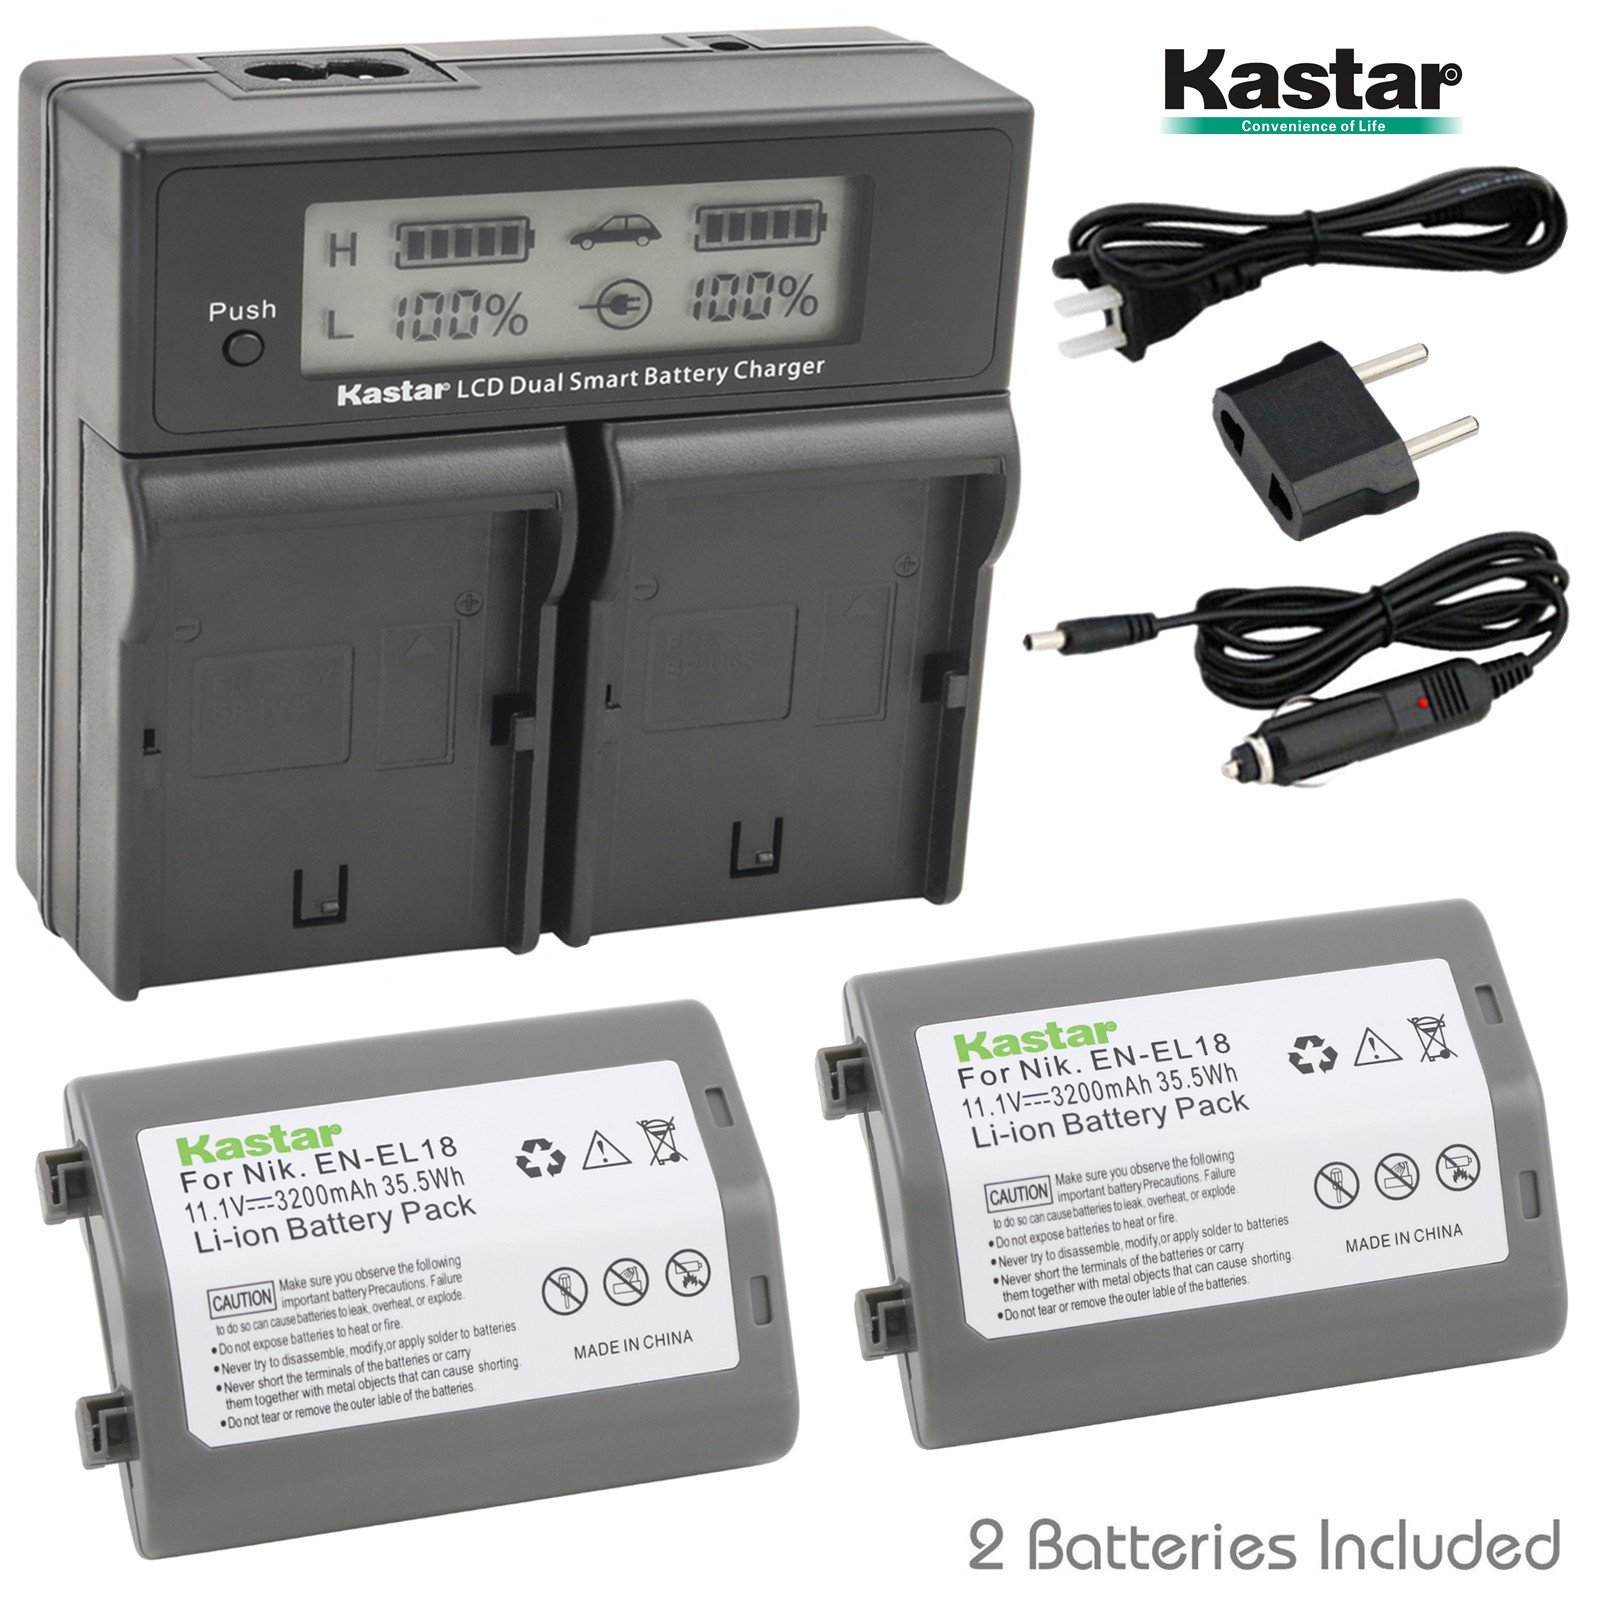 Kastar LCD Dual Smart Fast Charger & Battery (2 PACK) for Nikon EN-EL18, EN-EL18a, ENEL18, ENEL18a, MH-26, MH-26a, MH26 and Nikon D4, D4S, D5 Digital SLR Camera, Nikon MB-D12, D800, D800E Battery Grip